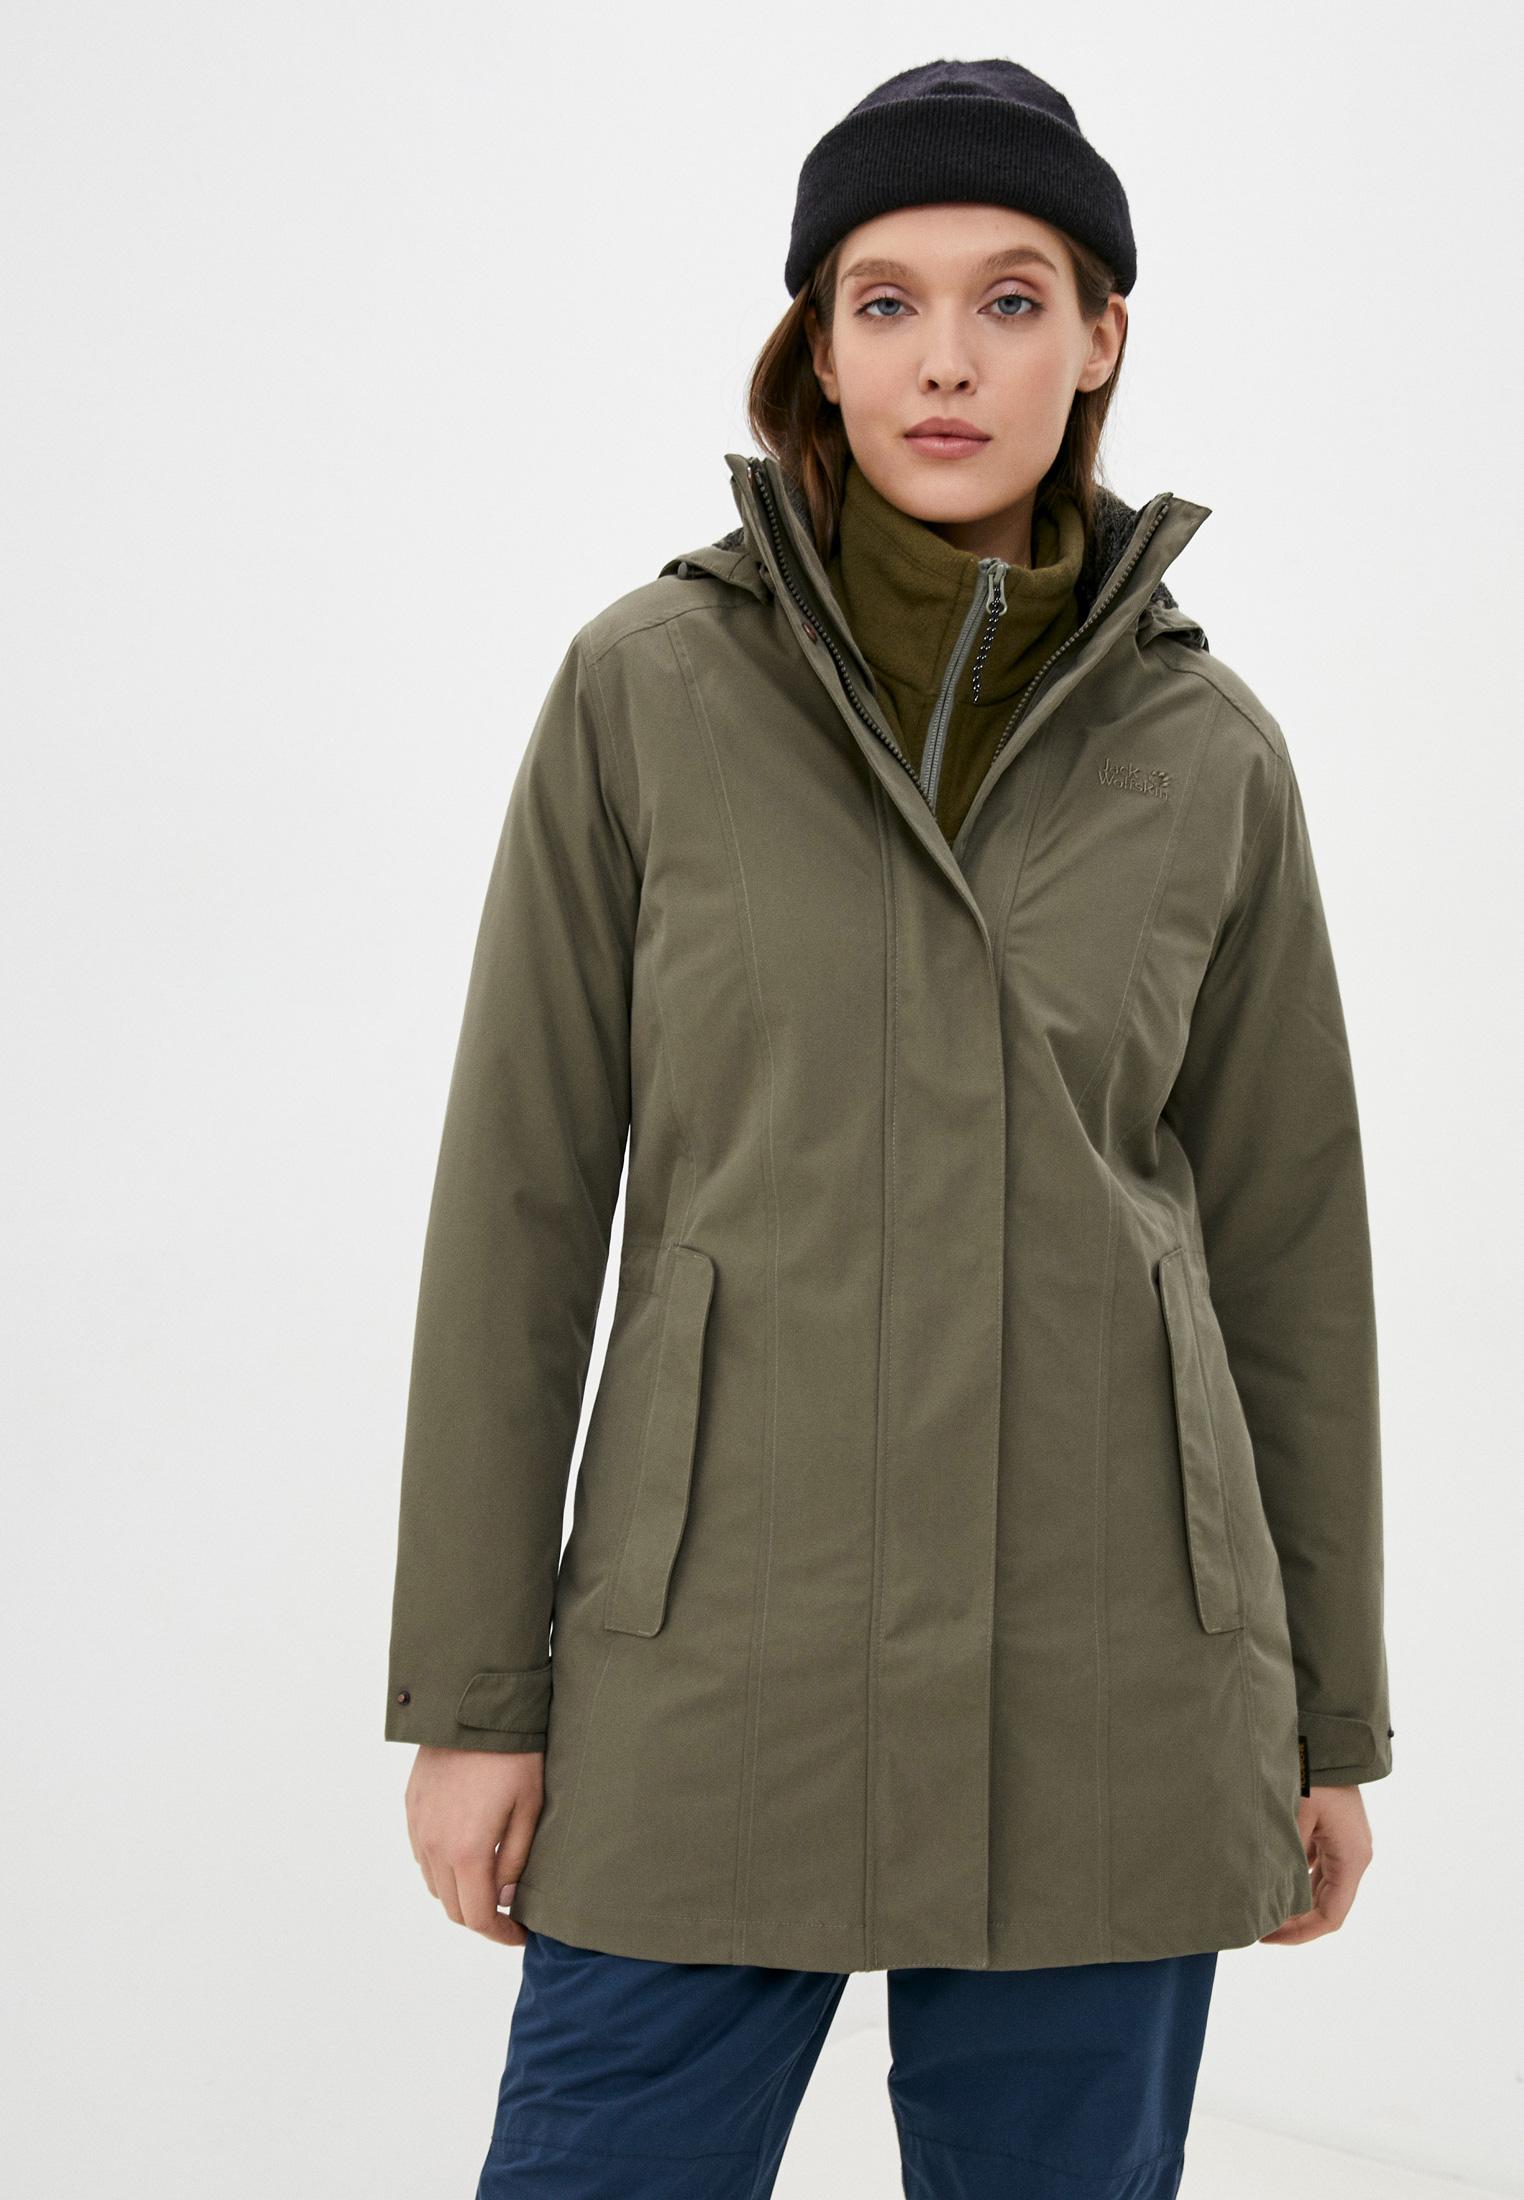 Женская верхняя одежда Jack Wolfskin 1107732-4690